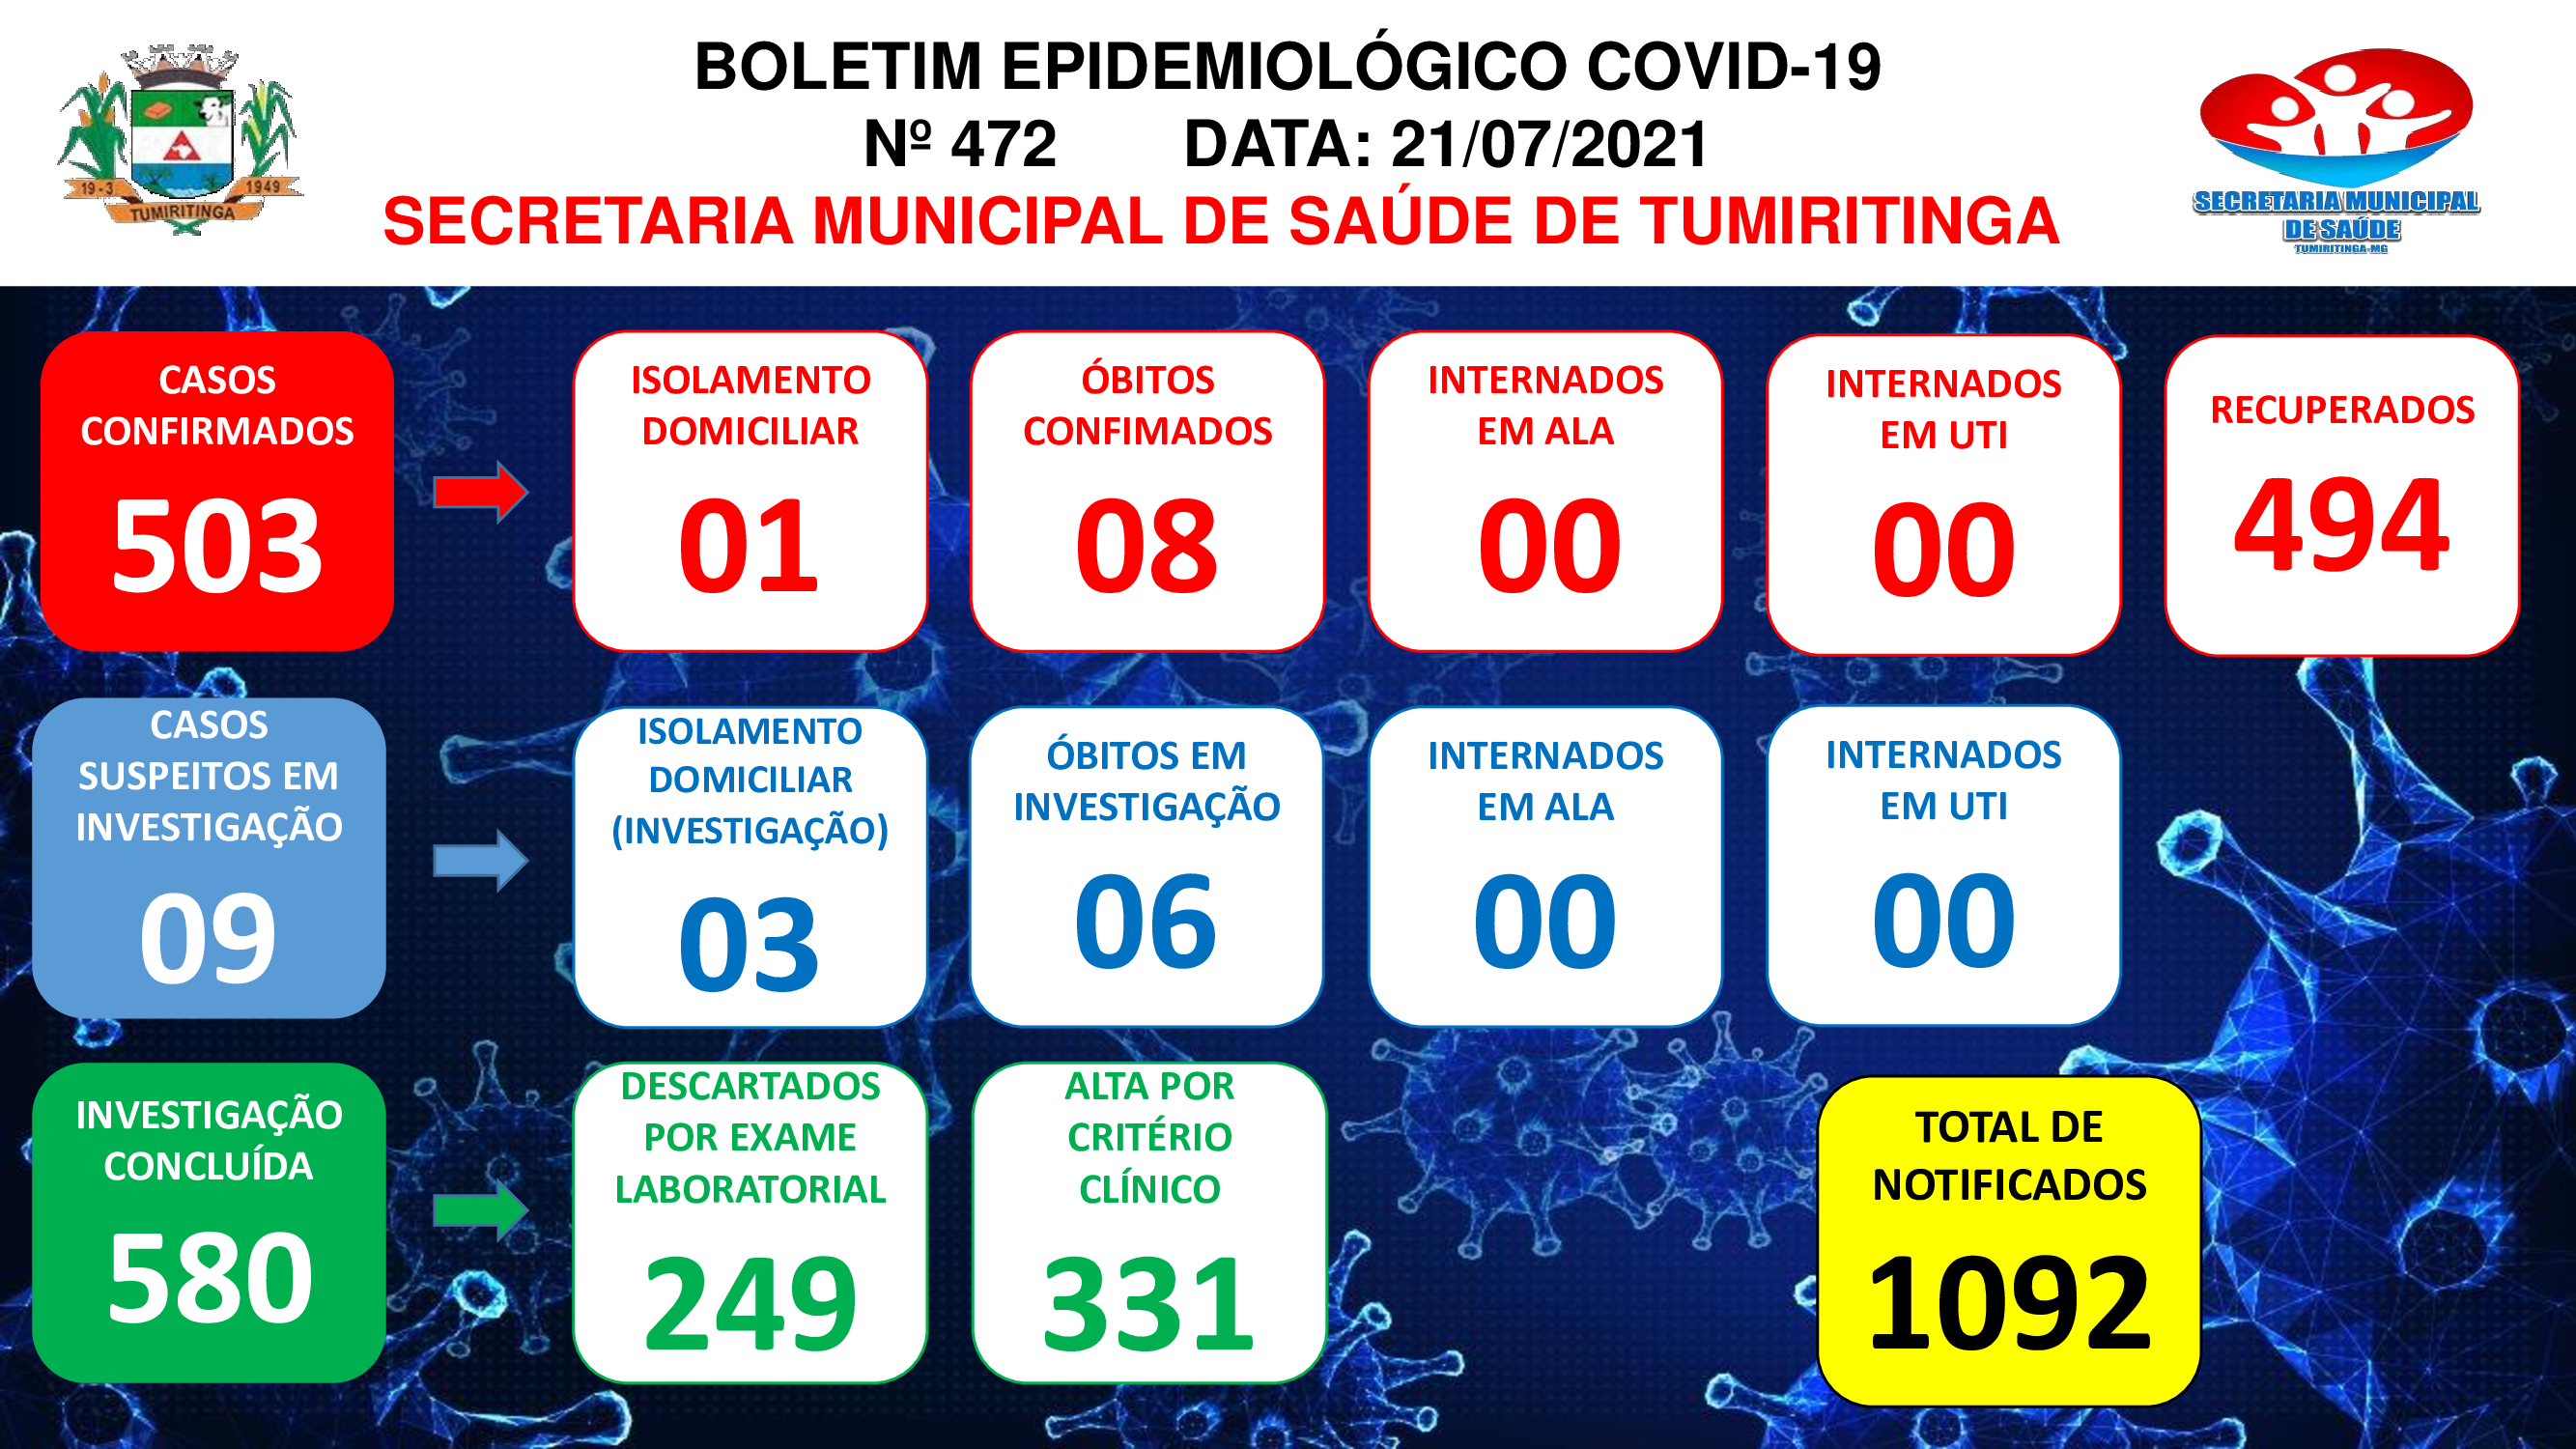 BOLETIM EPIDEMIOLÓGICO CORONAVÍRUS N° 472 - 21/07/2021